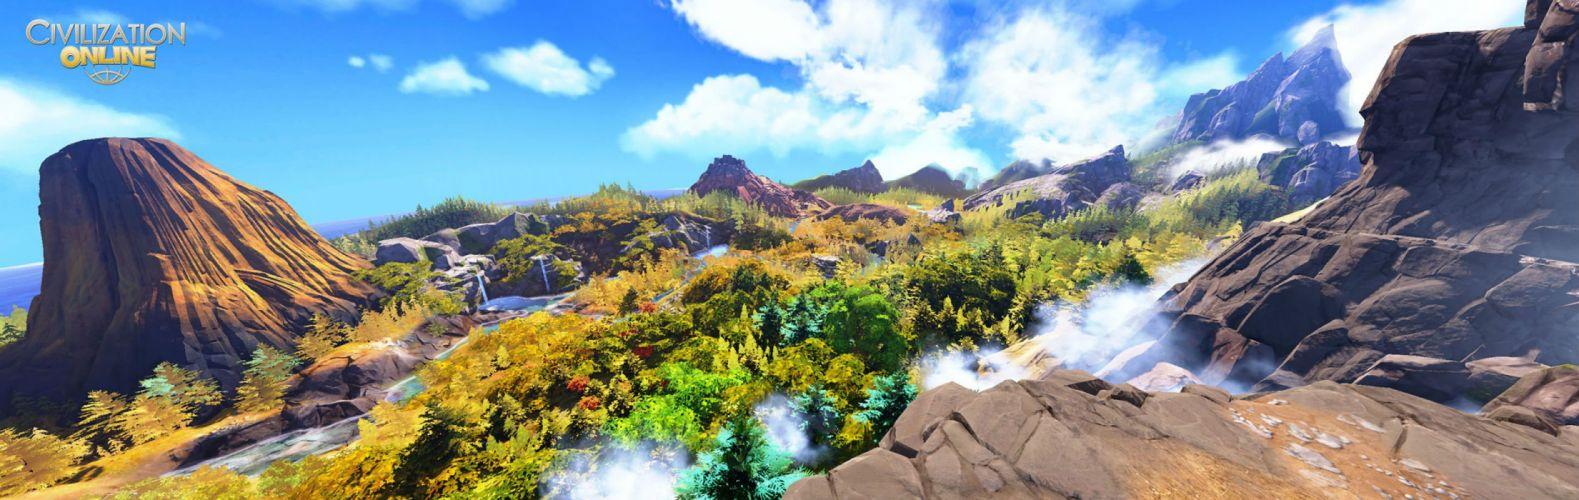 CIVILIZATION ONLINE empire building mmo rpg fantasy strategy adventure 1civilo history detail sci-fi artwork architecture landscape forest mountains wallpaper